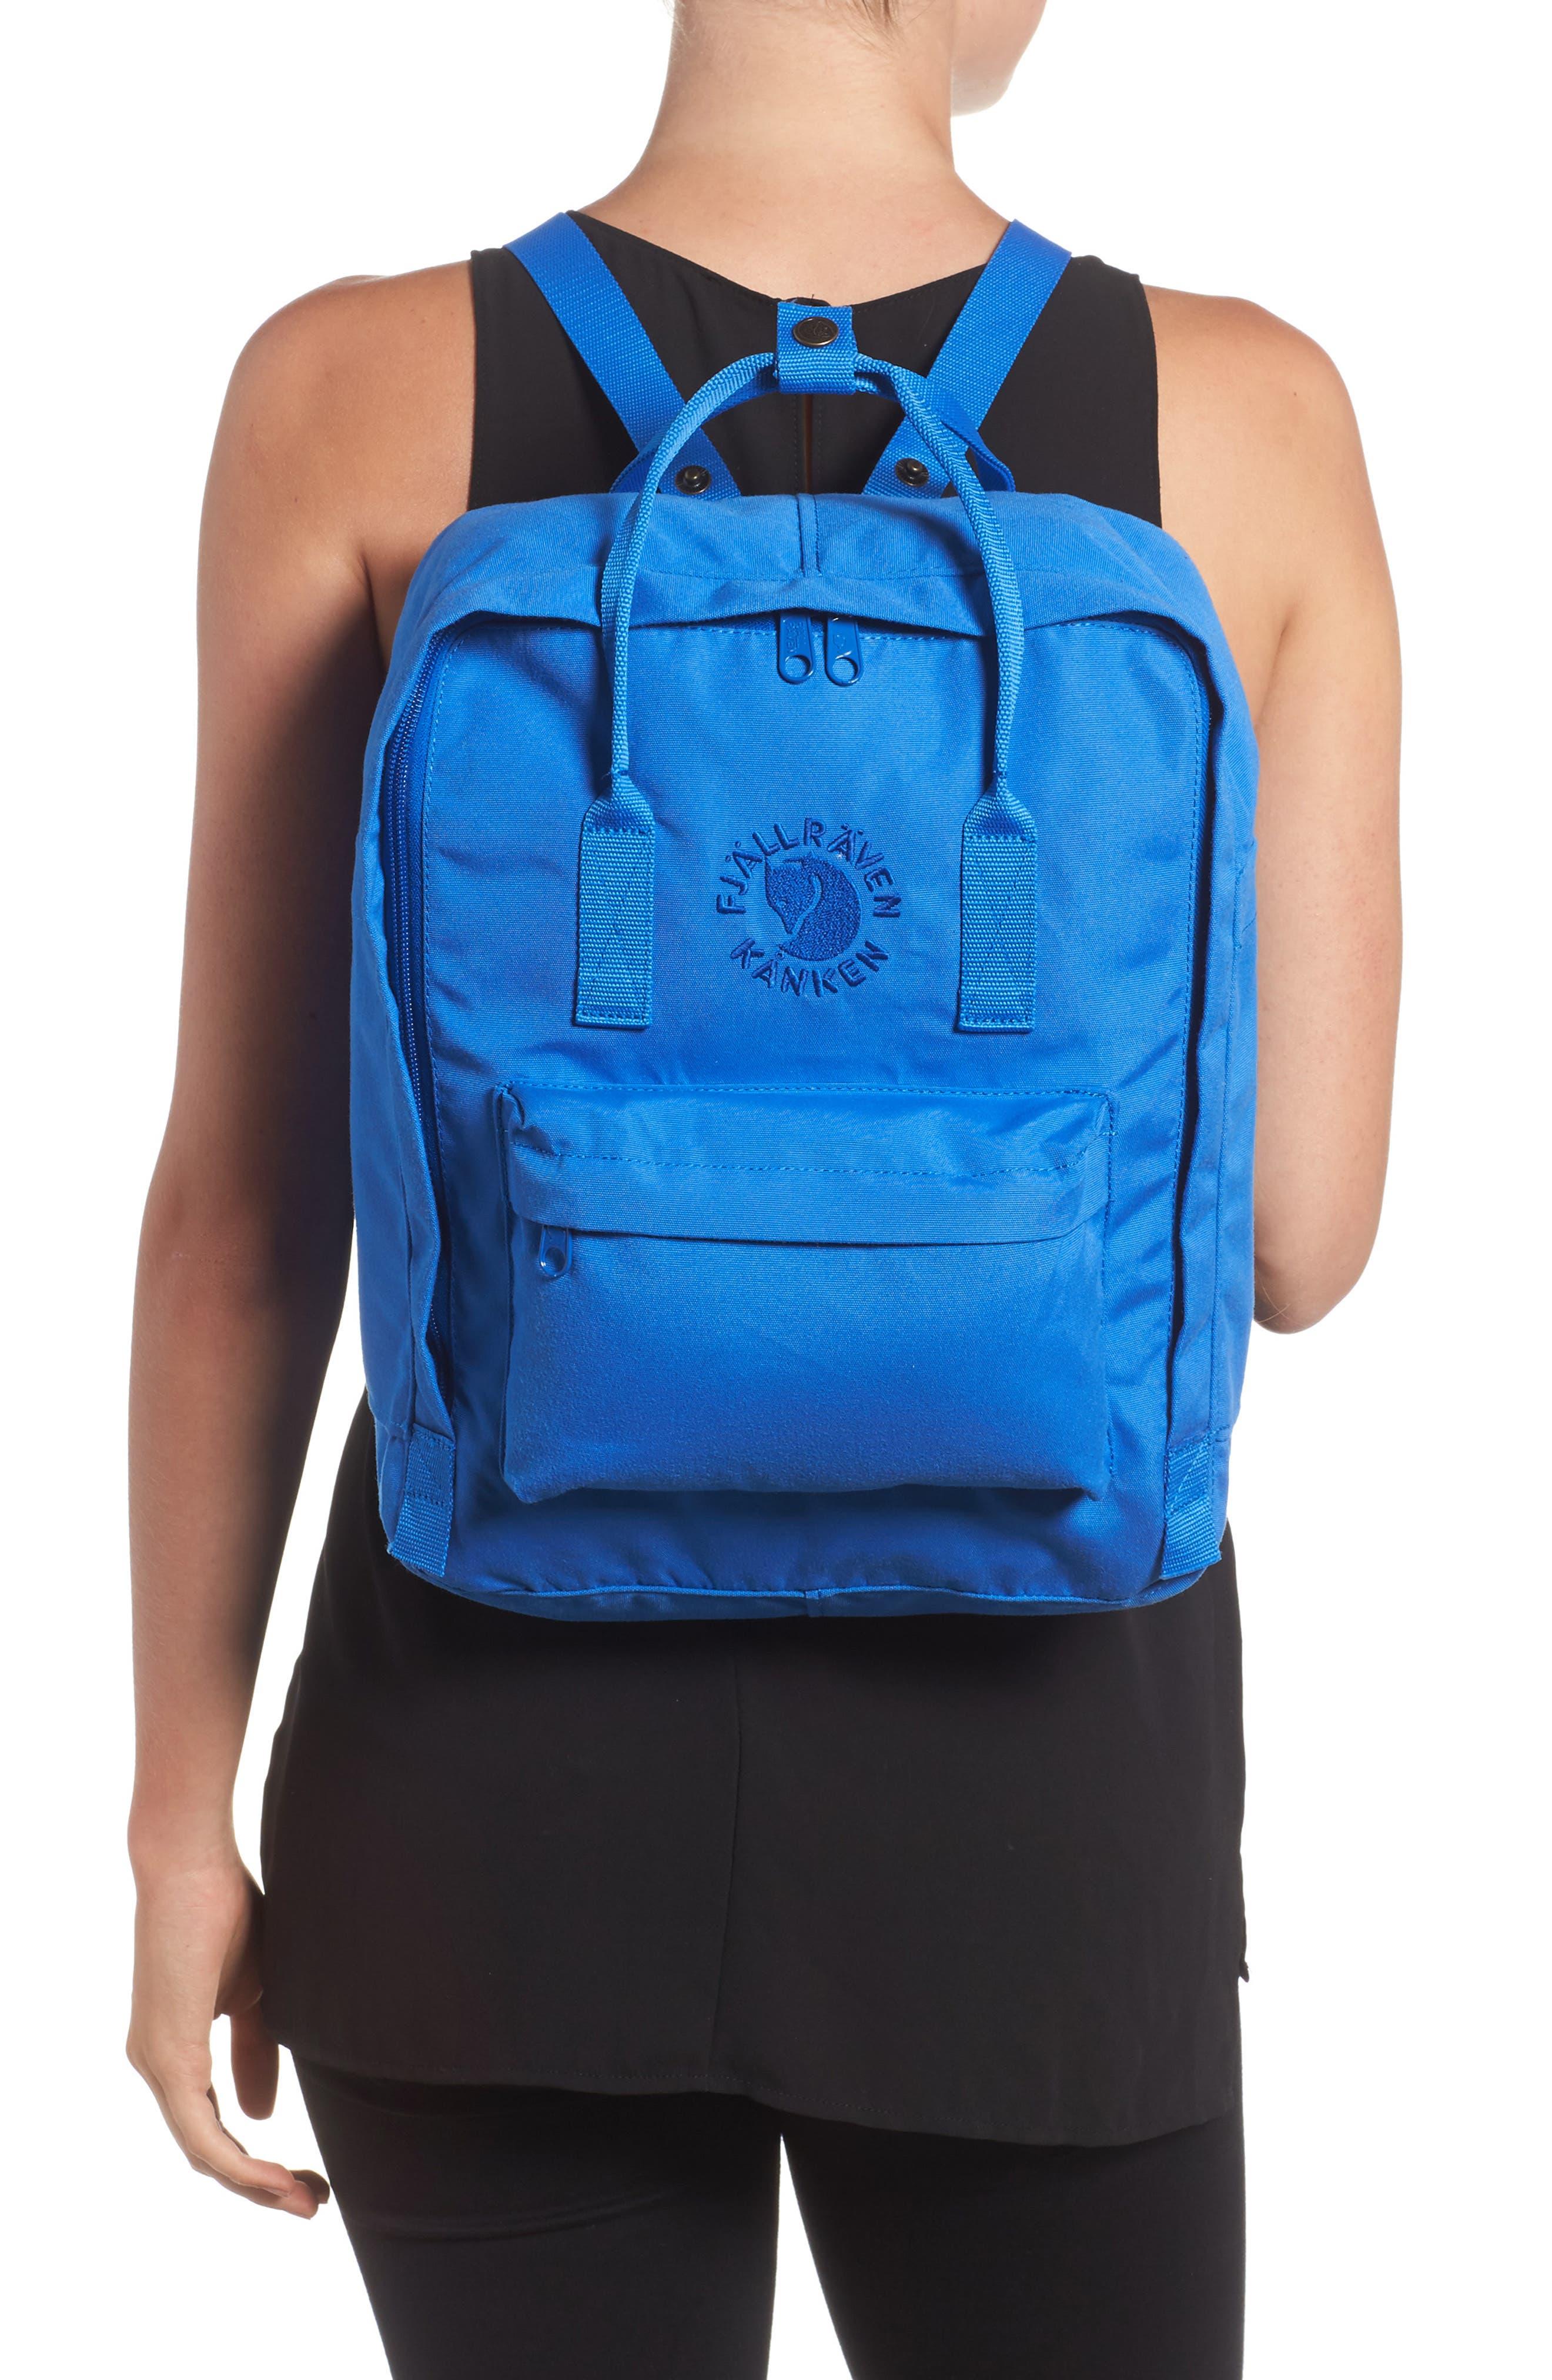 Re-Kånken Water Resistant Backpack,                             Alternate thumbnail 2, color,                             UN BLUE